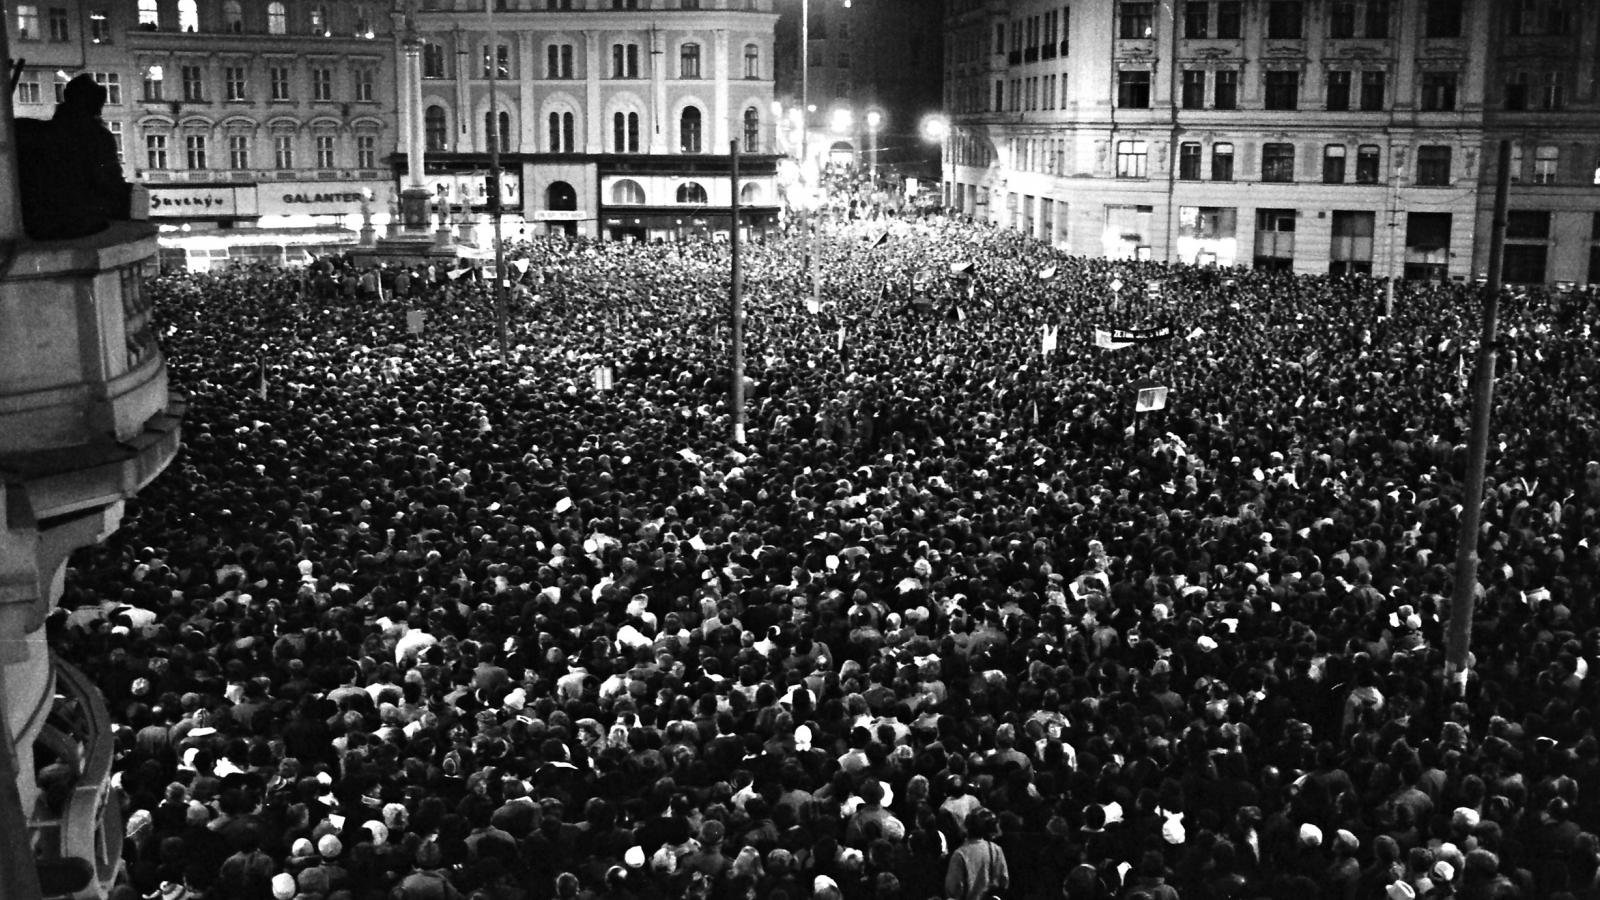 Listopad 89 na fotografiích Františka Kressy